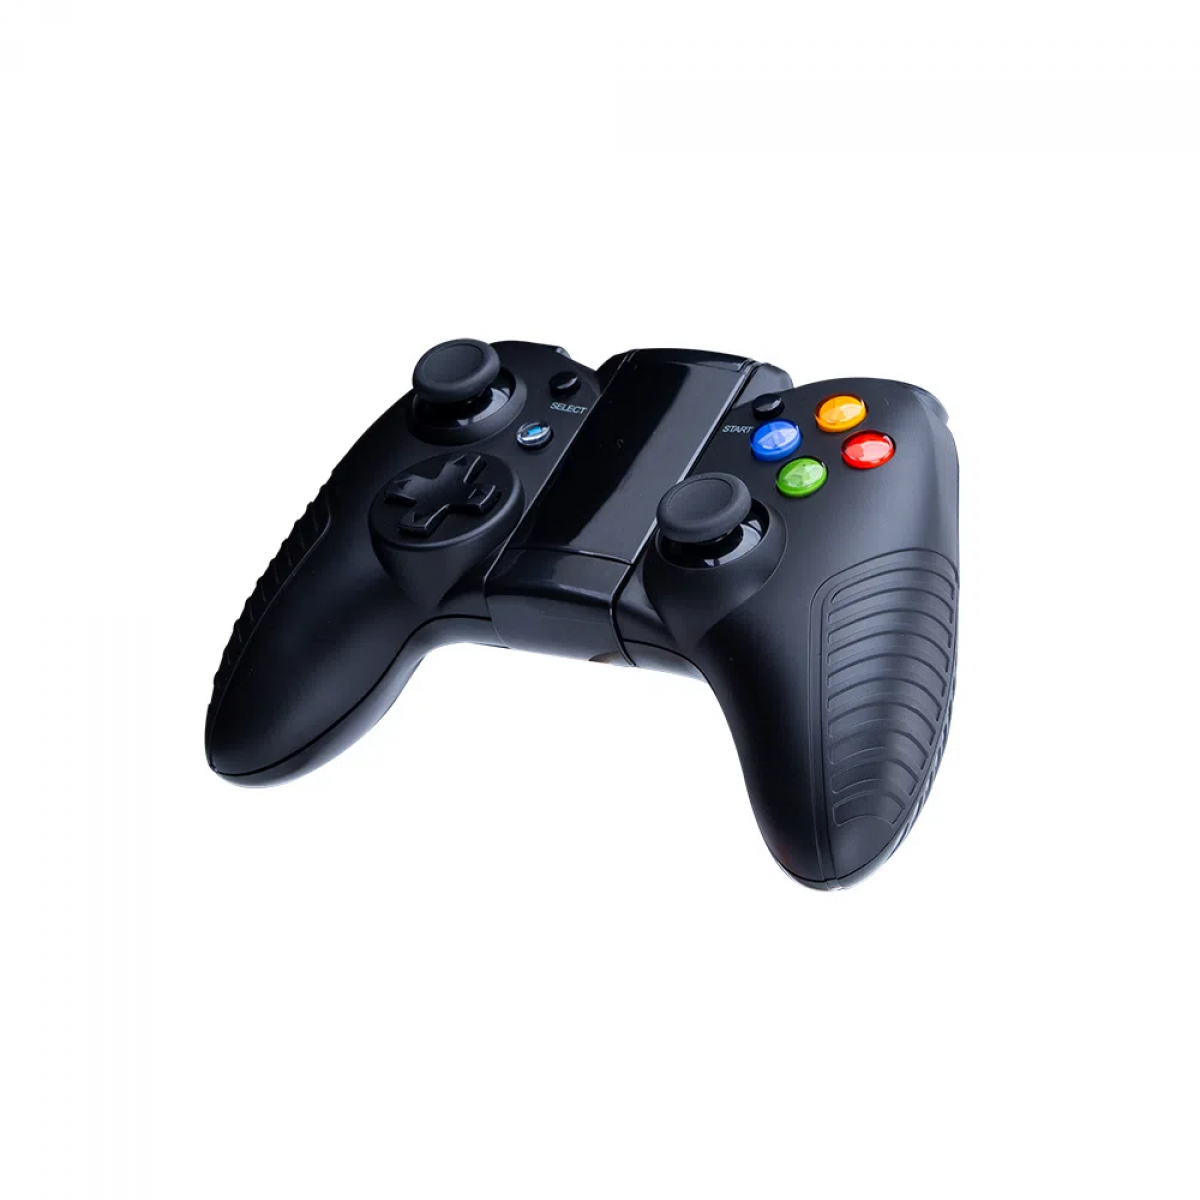 Controle para Mobile Dazz Orbiter, Android e IOS, Black, 62000001